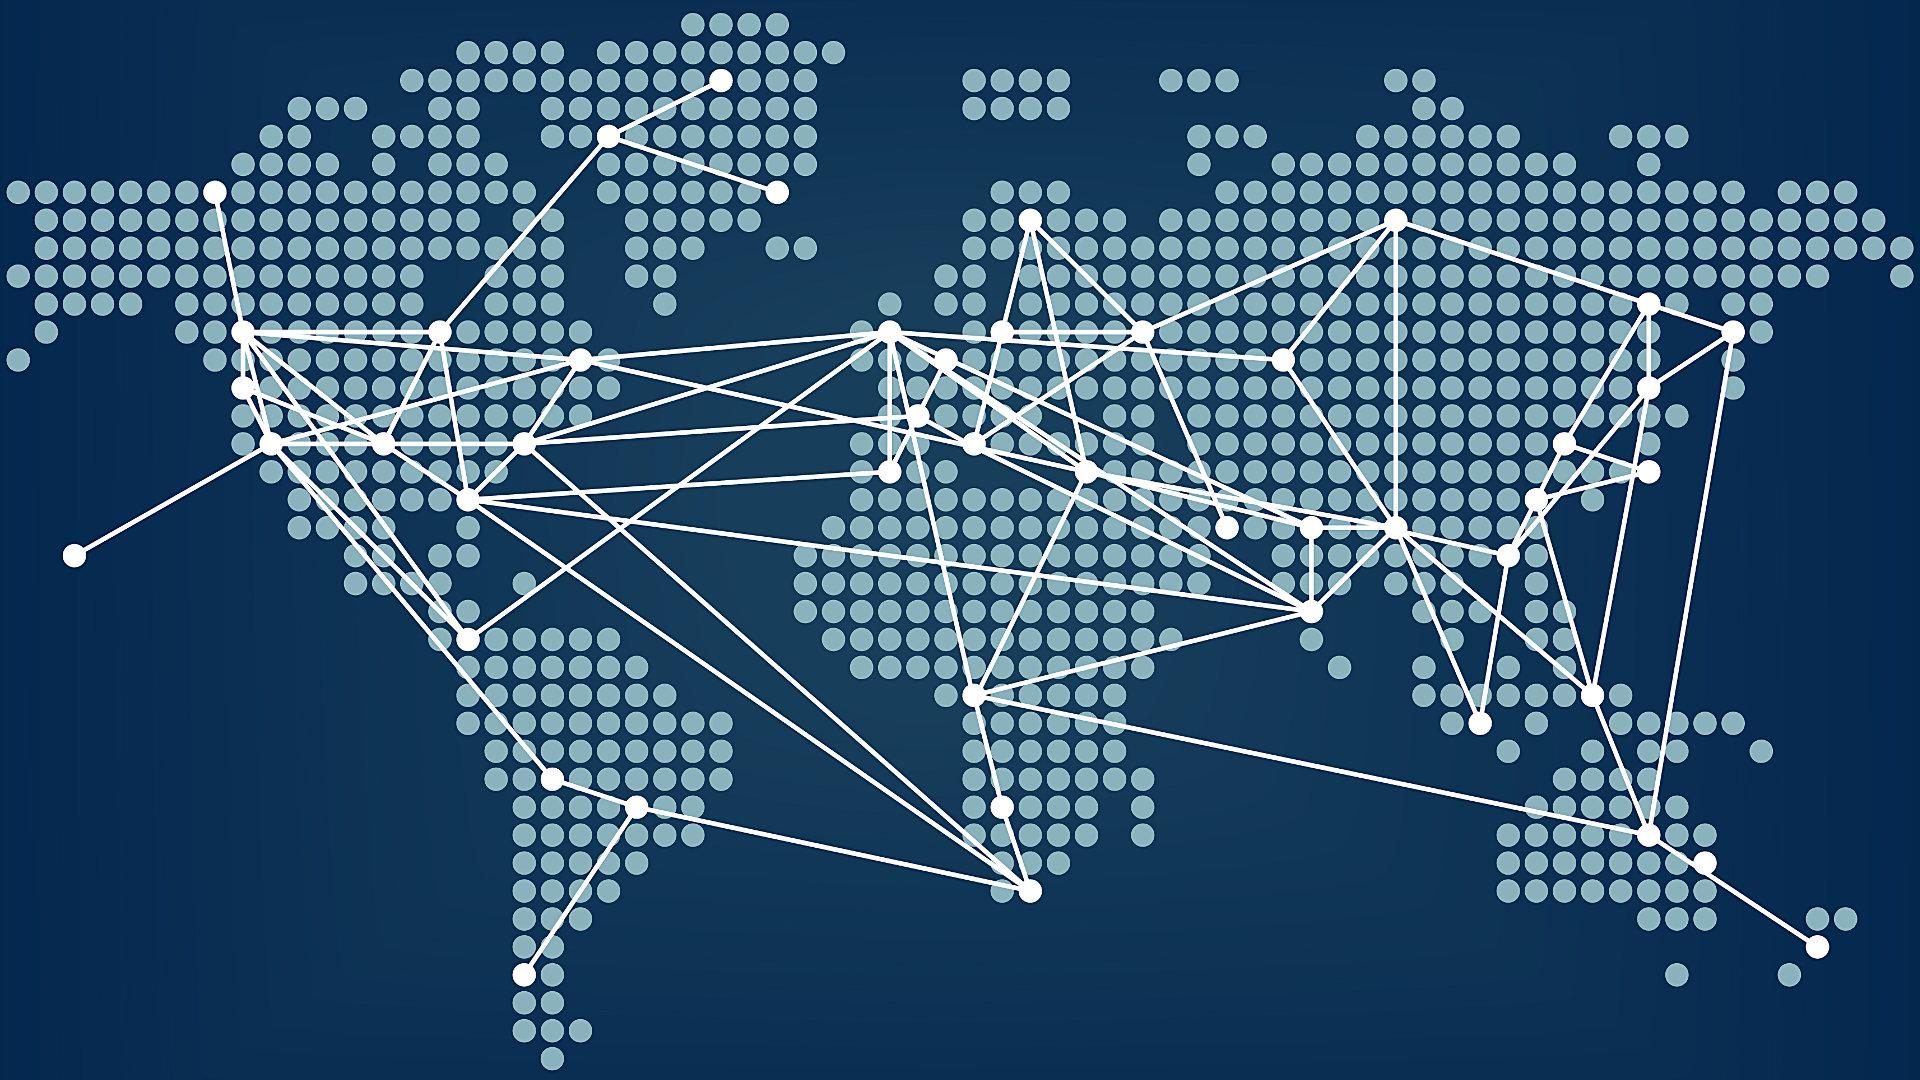 world internet traffic